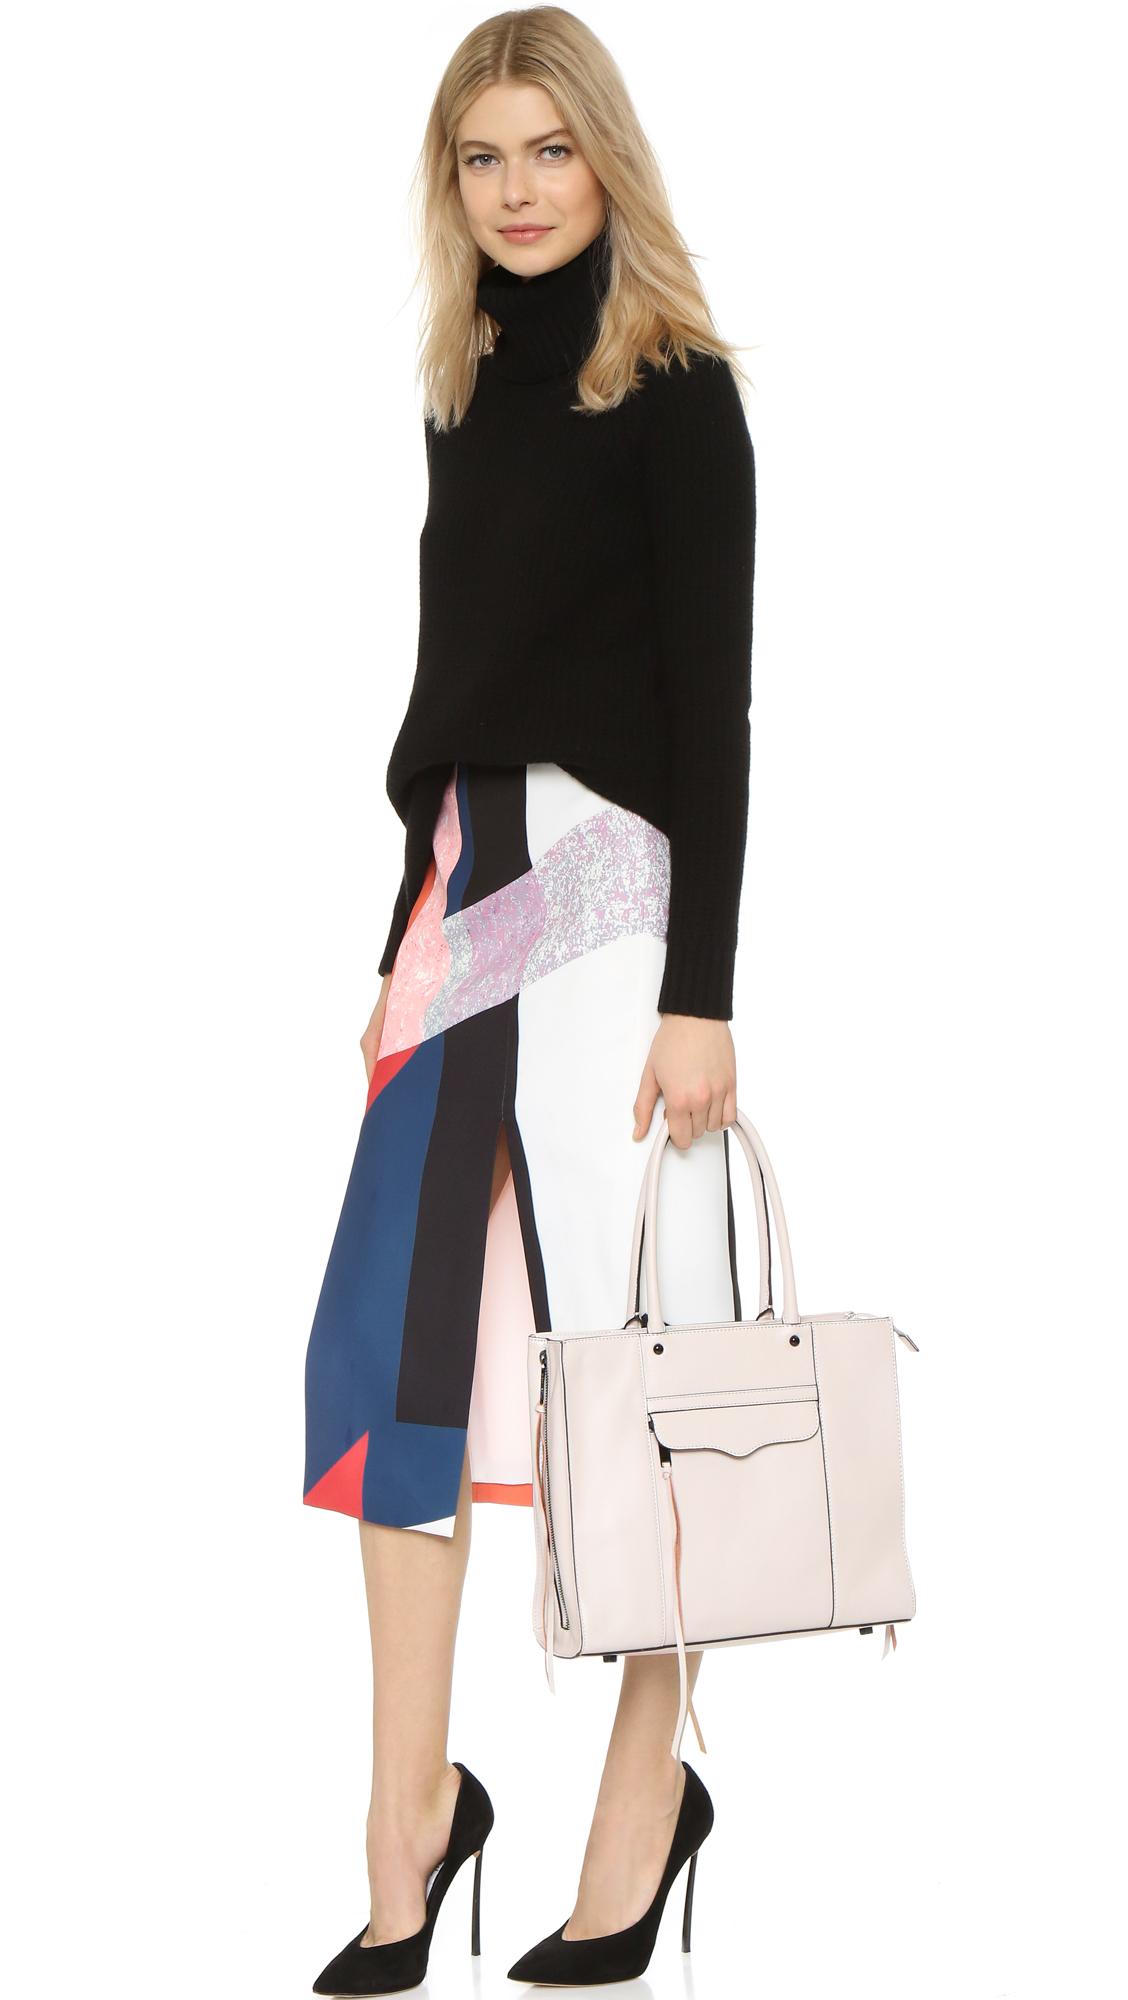 Rebecca Minkoff Size Zip Medium Mab Tote Putty In Gray